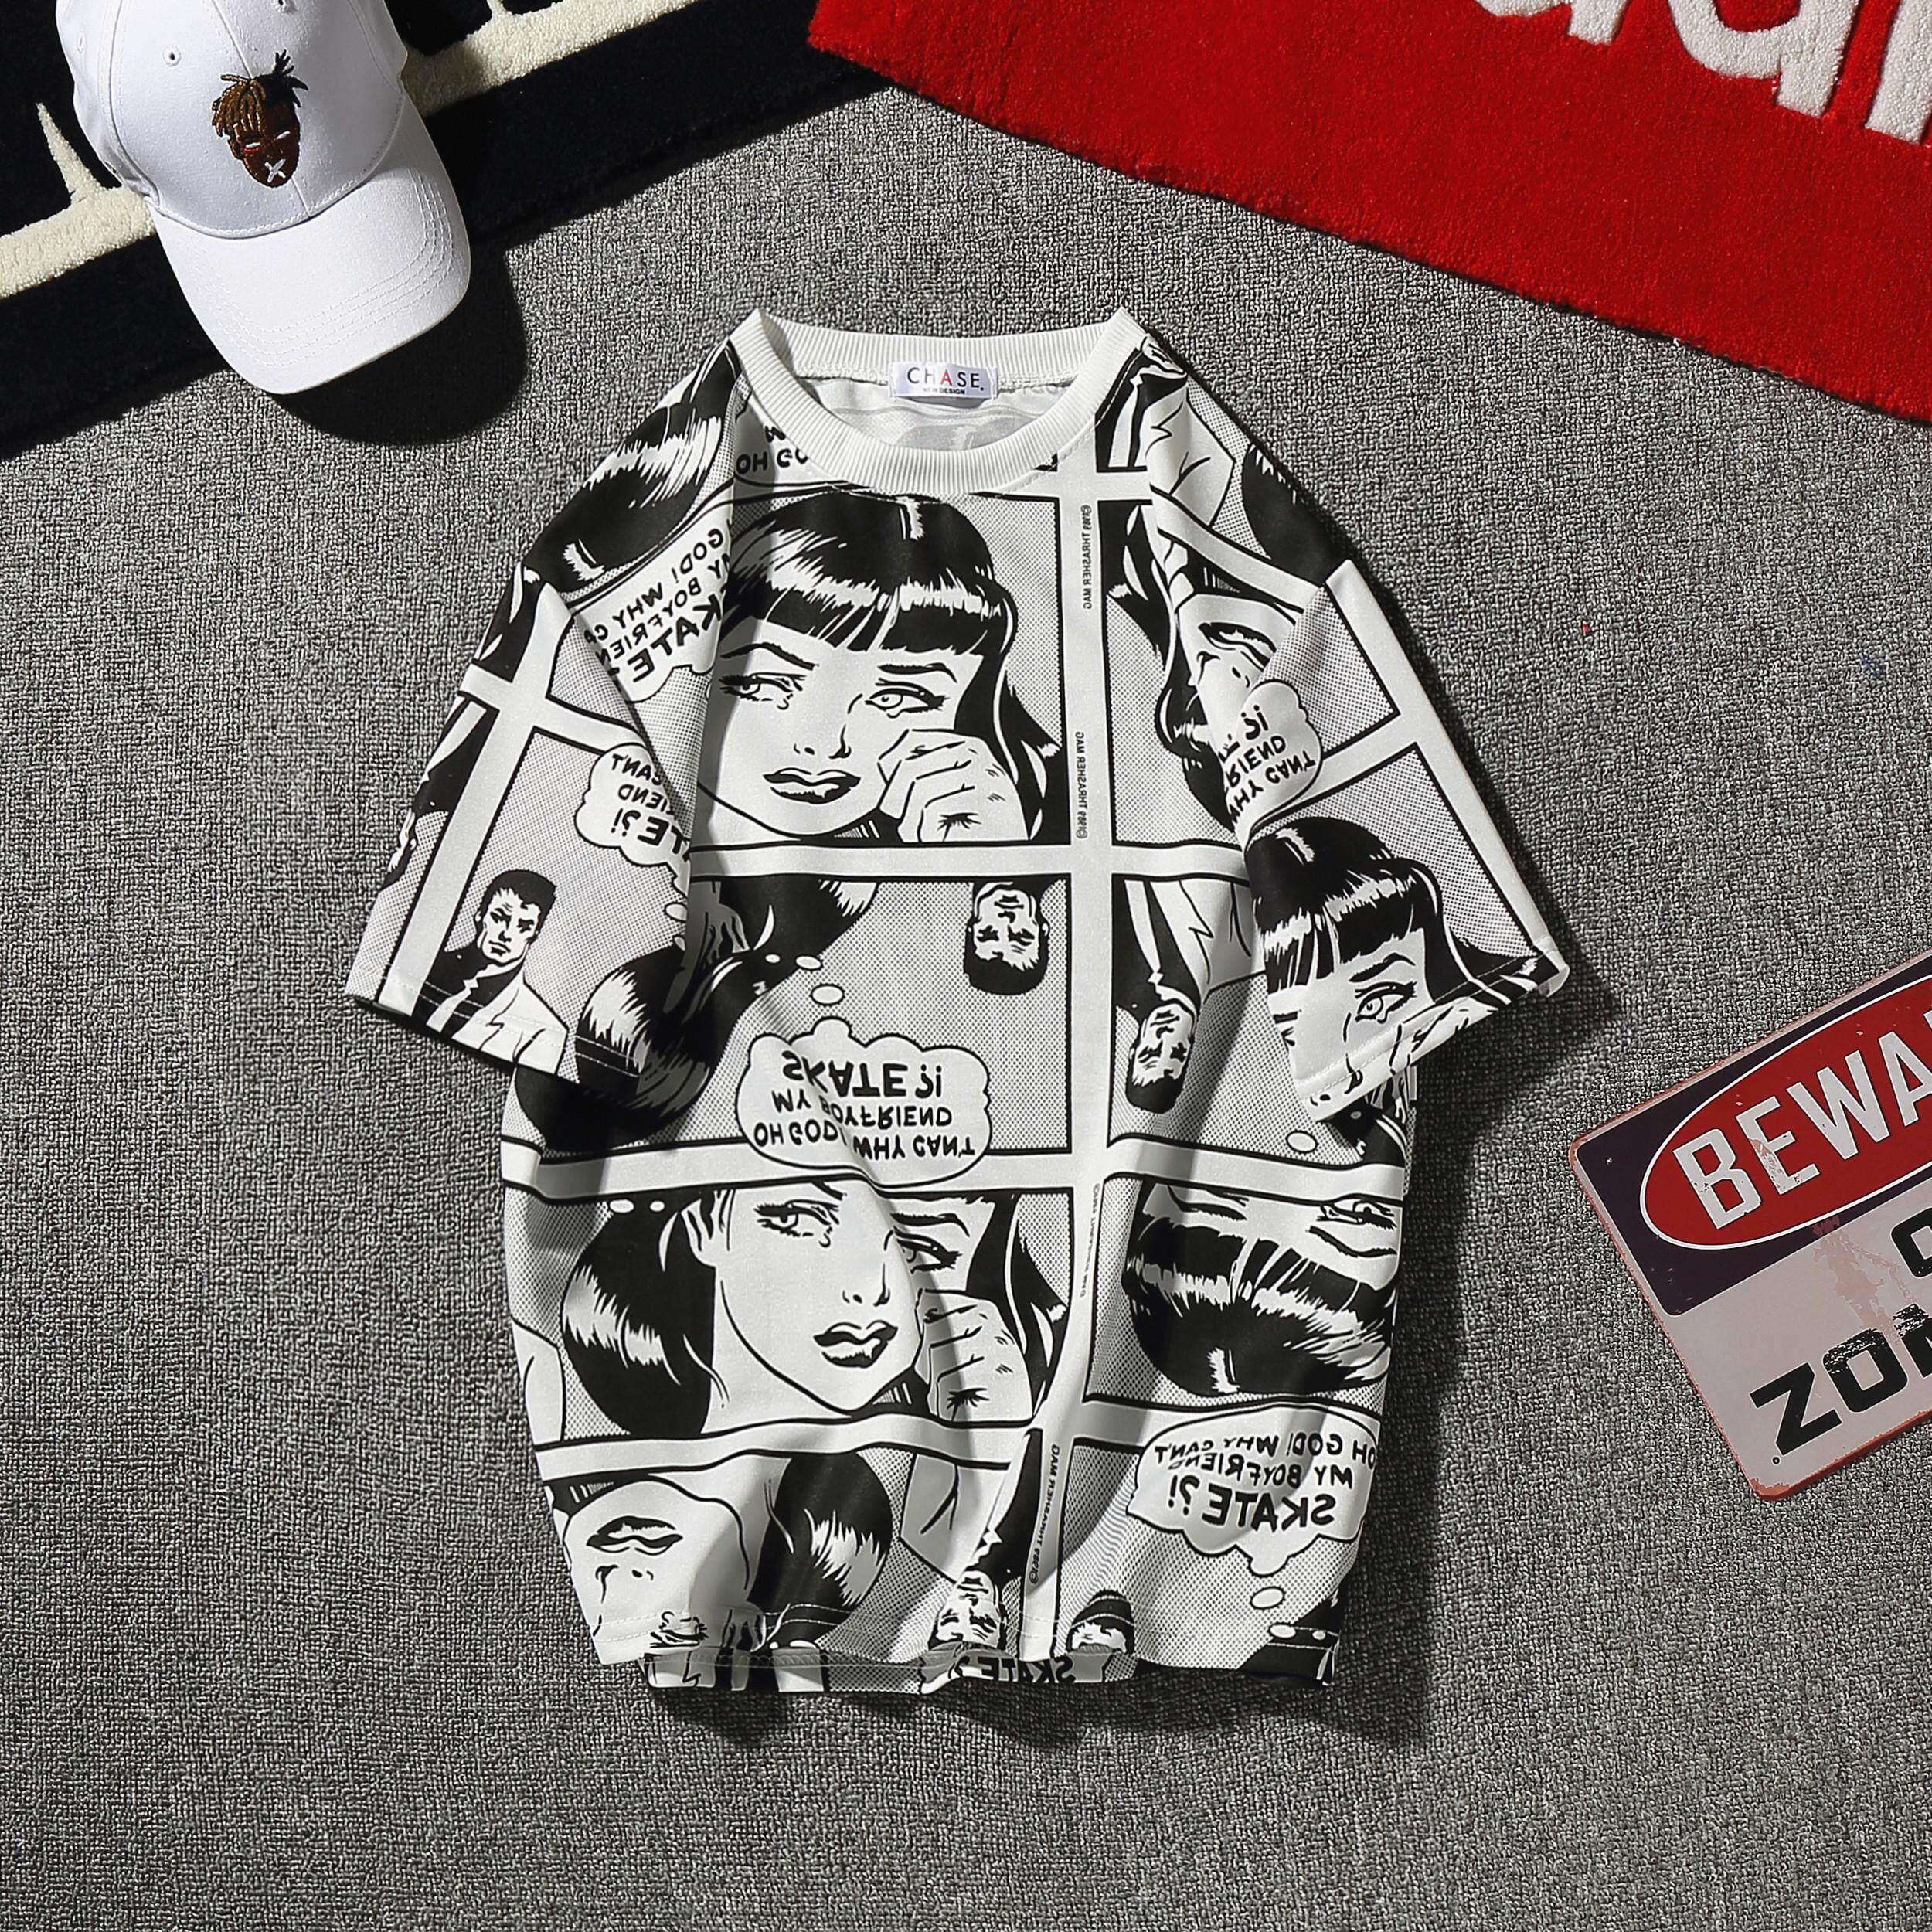 Celana Panjang Pendek Olahraga Pria Strit Leging Longpants Manset Musim Panas Komik Baju Kaos Lengan Manusia Sosial Tren 1 Paket